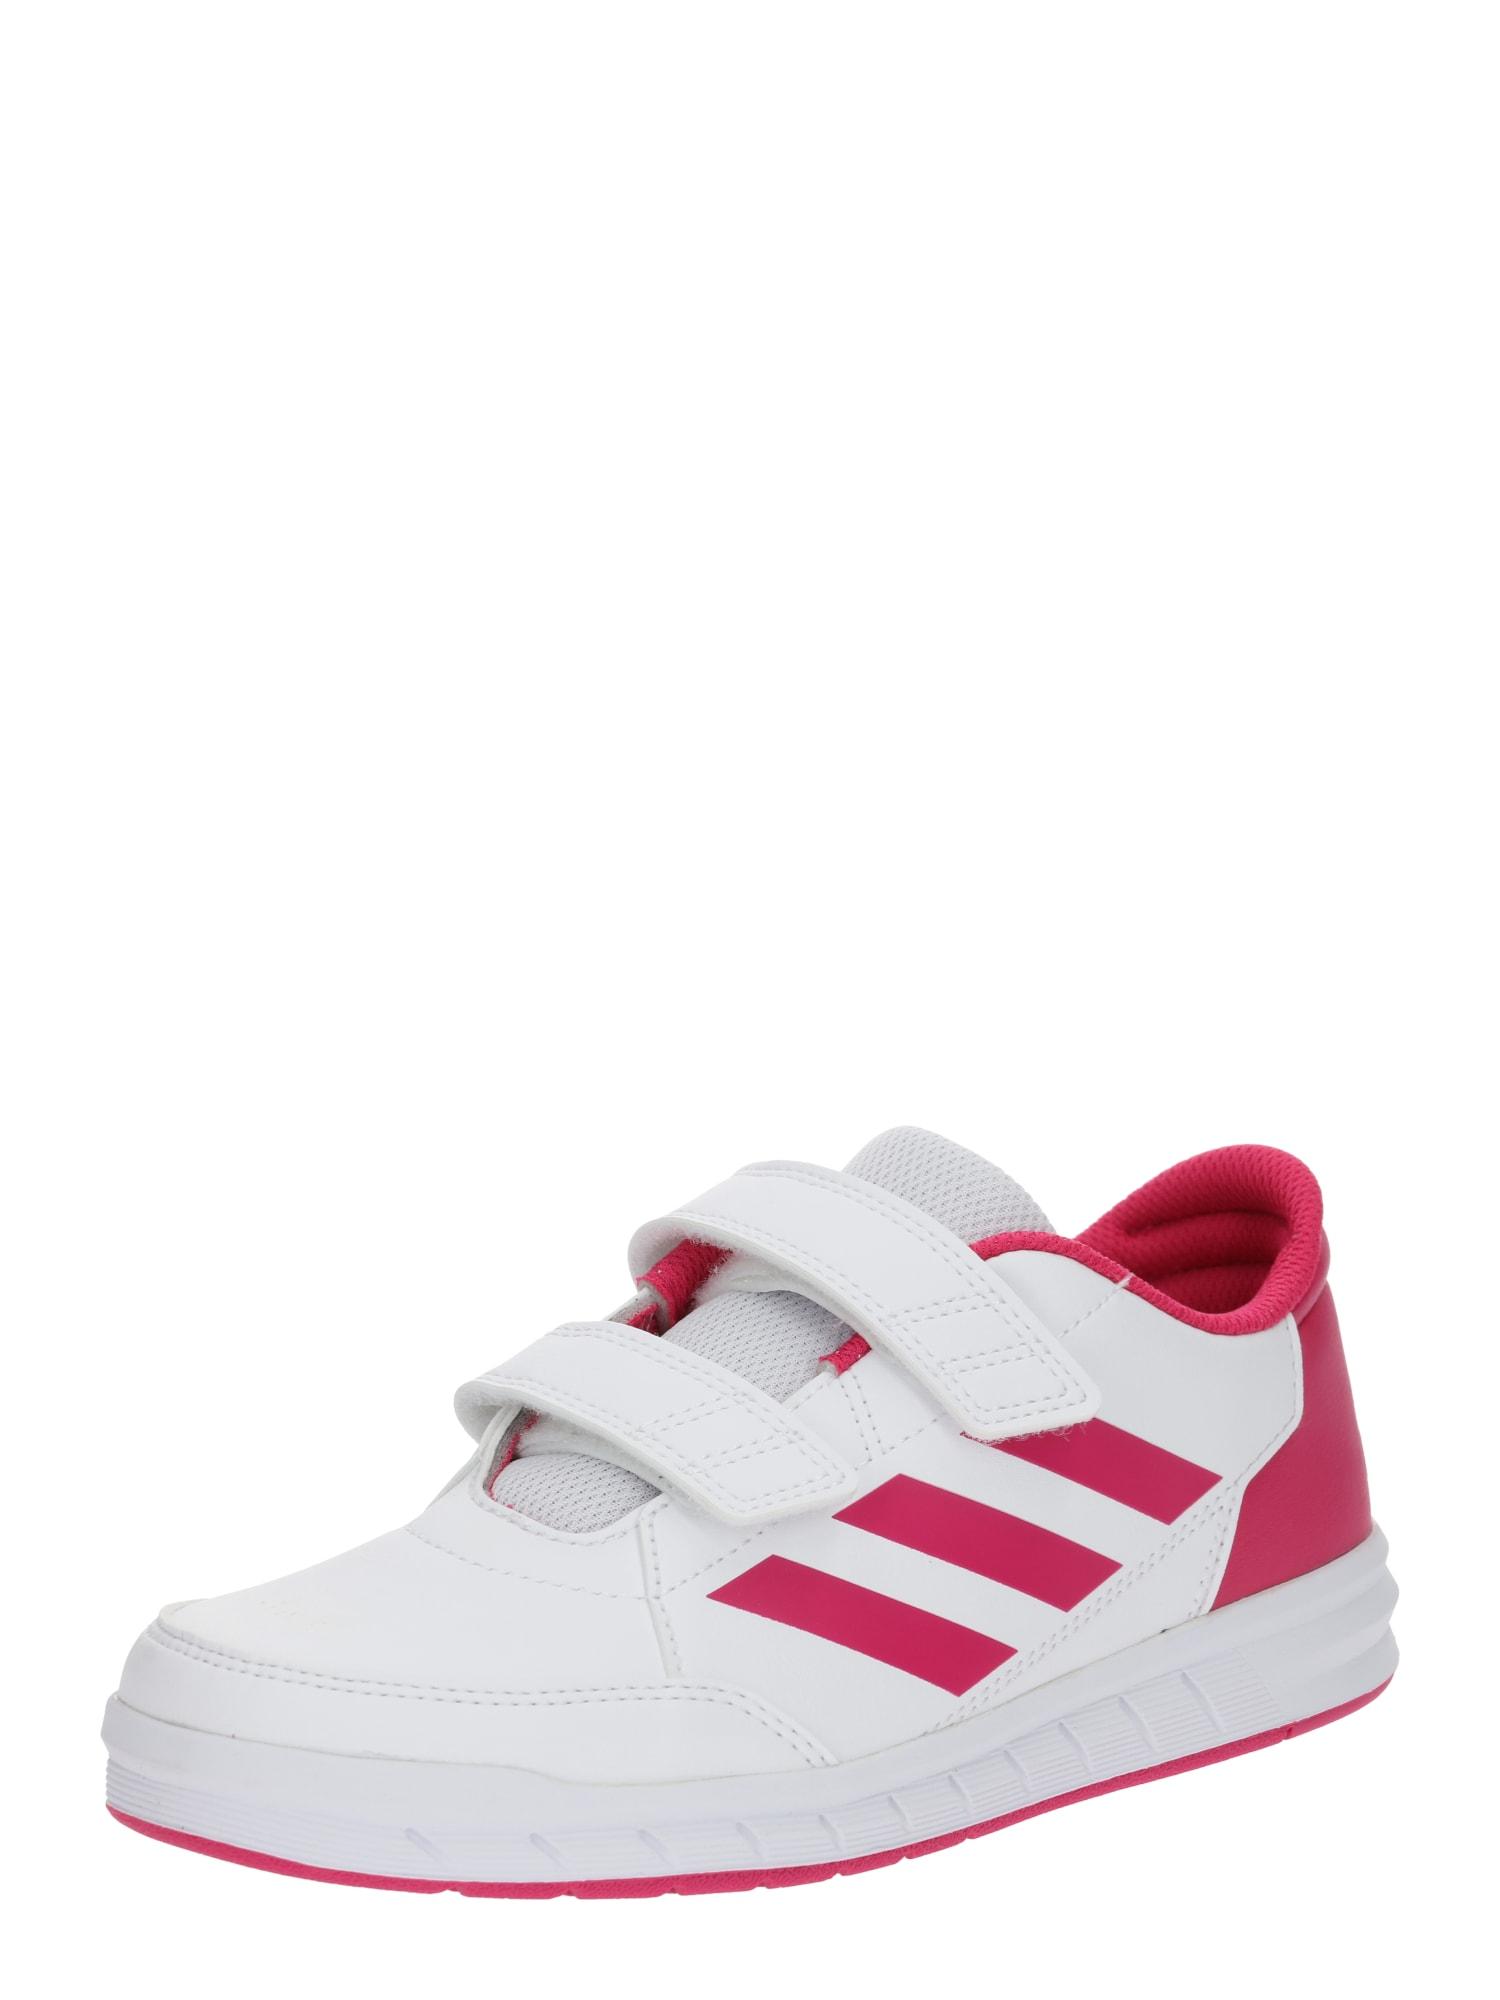 Sportovní boty AltaSport CF K pink bílá ADIDAS PERFORMANCE